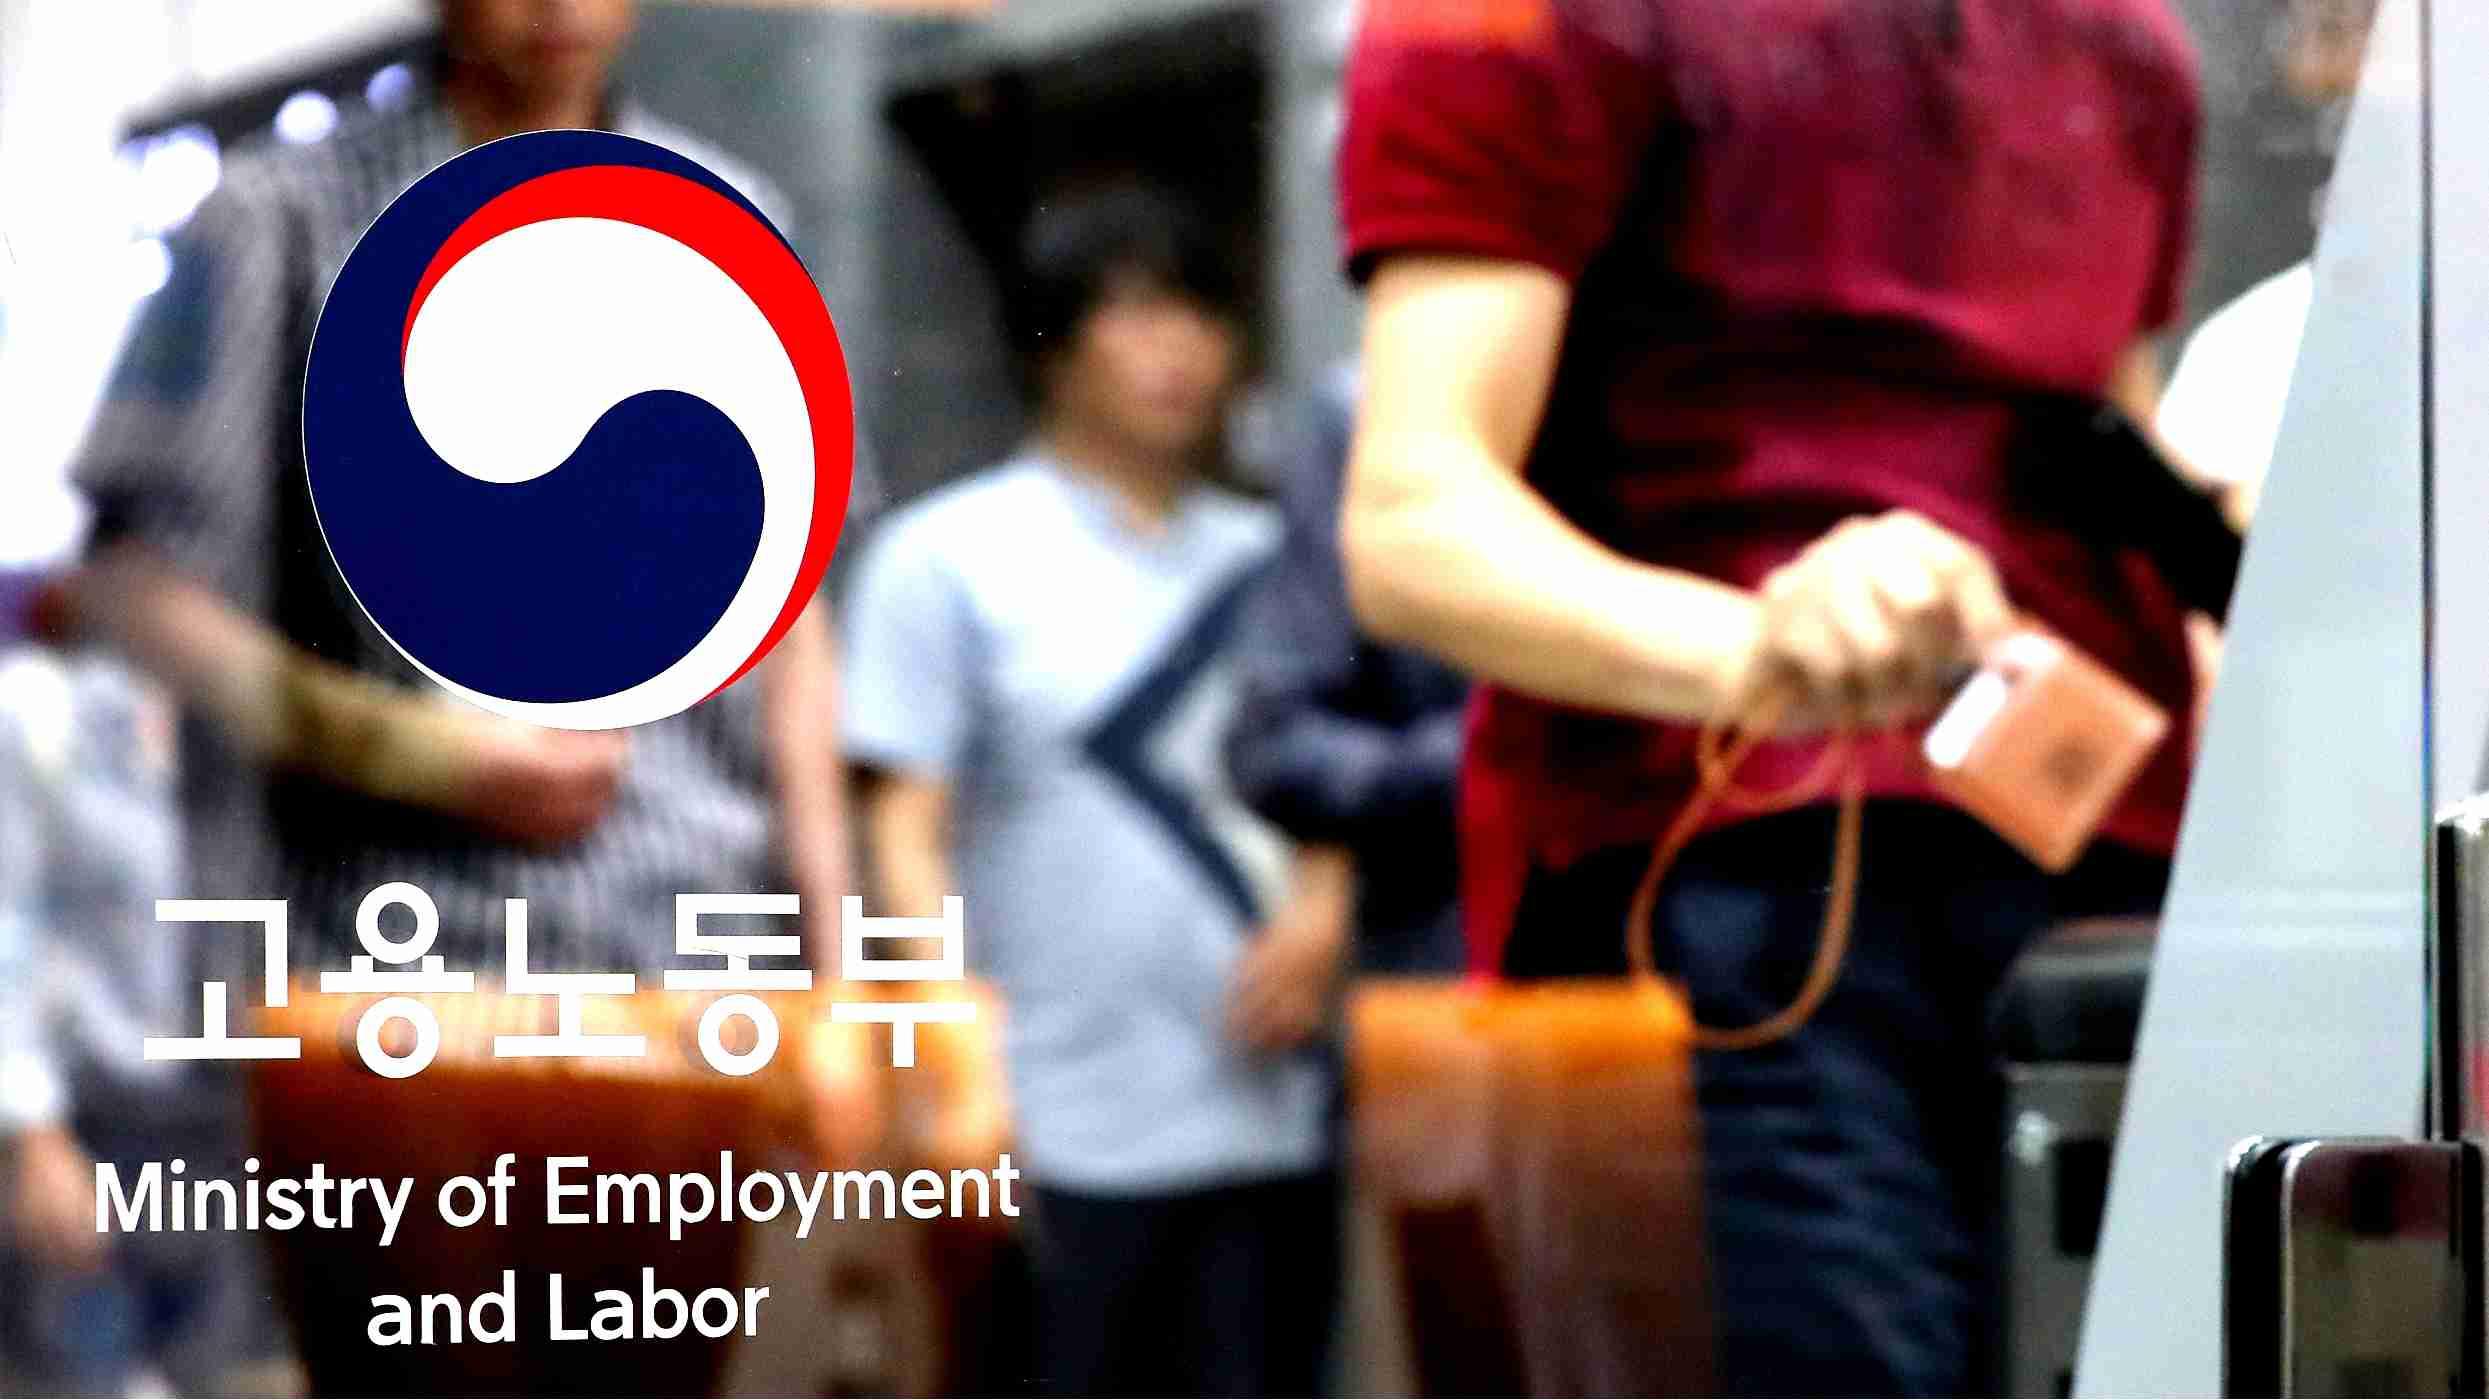 S. Korea labor reforms bid to tackle workaholic culture